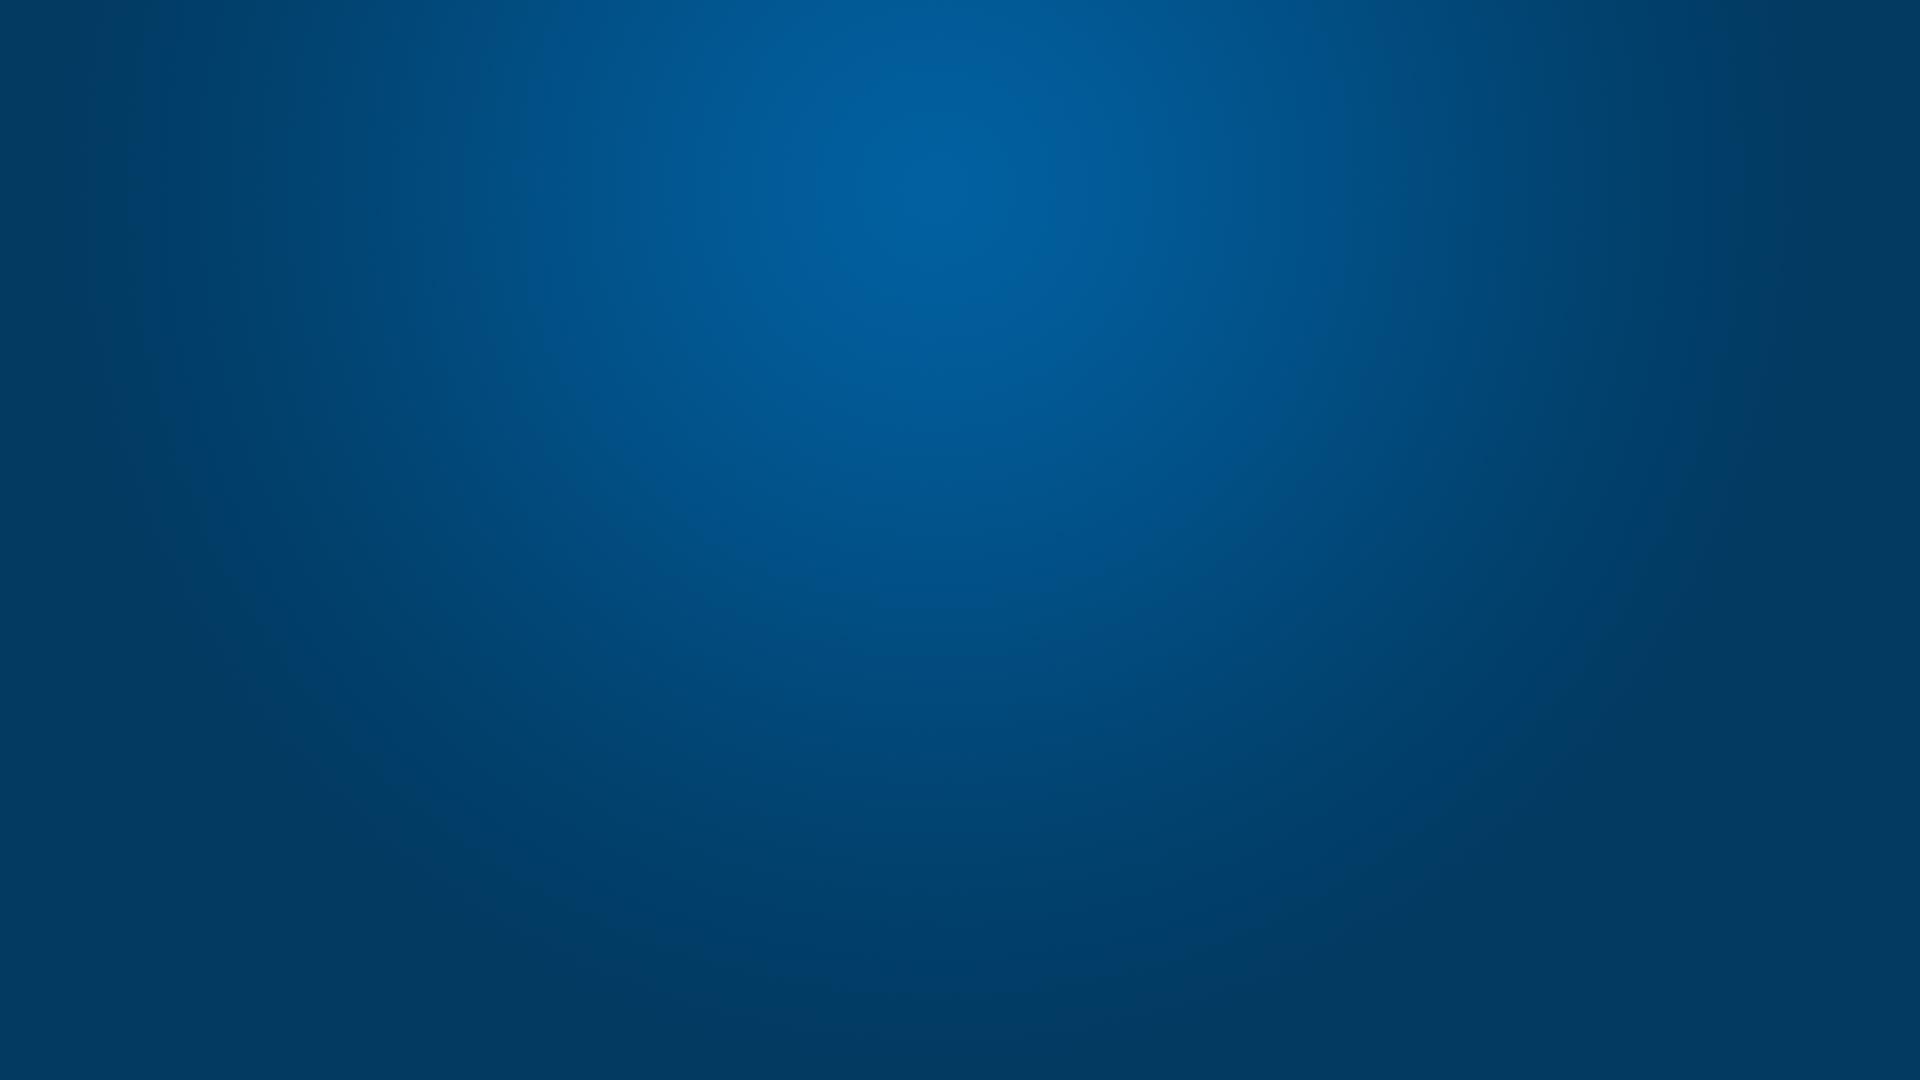 Background_Blue.jpg